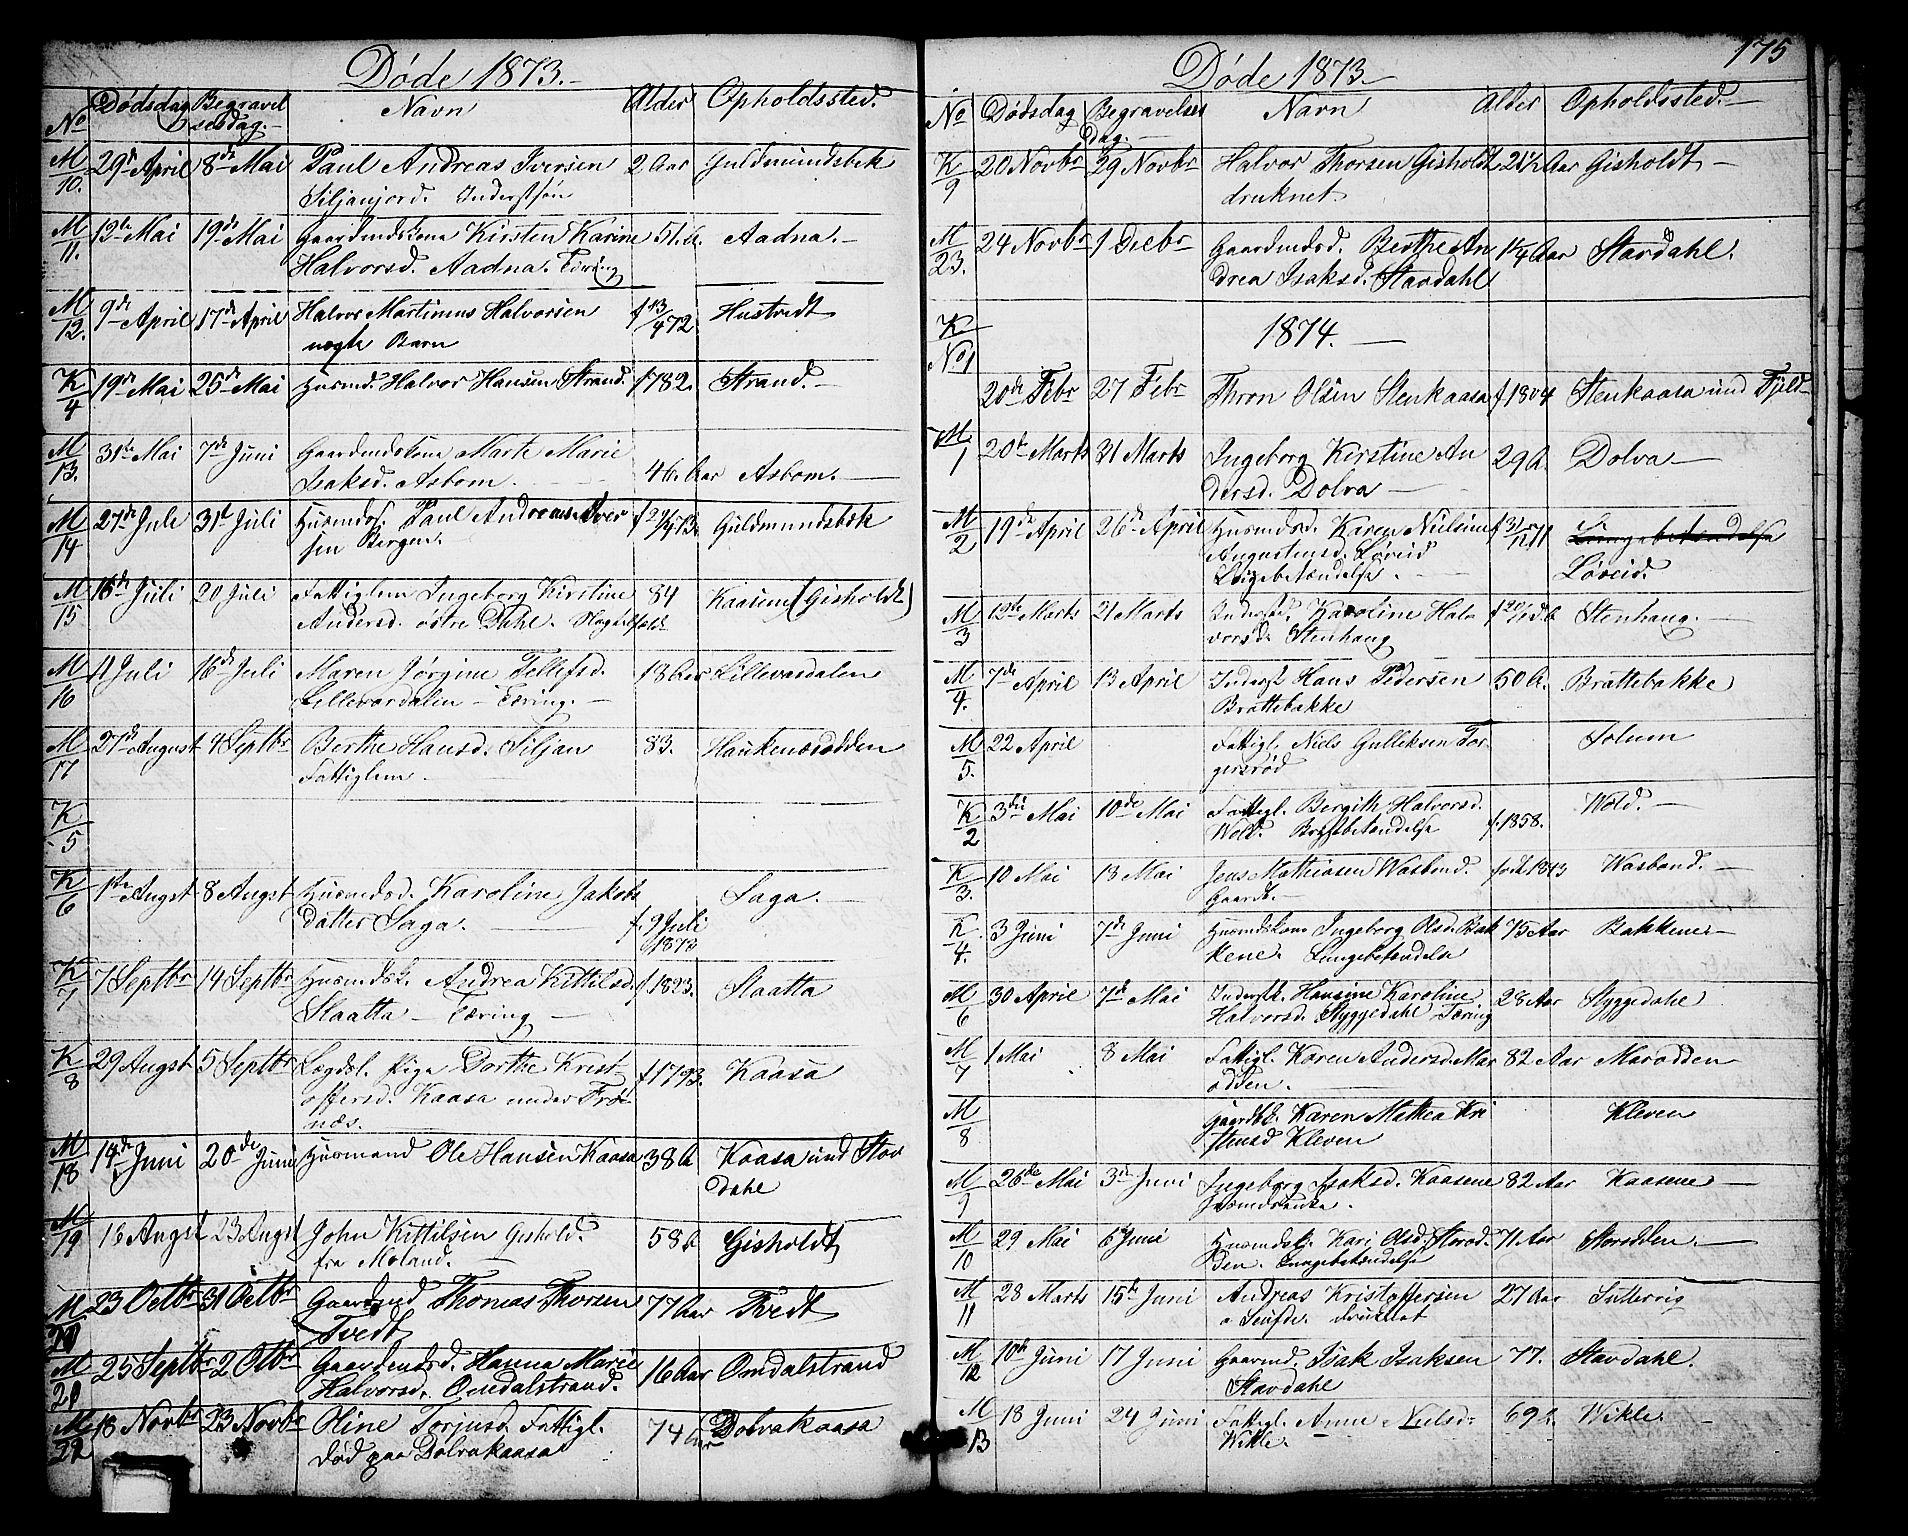 SAKO, Solum kirkebøker, G/Gb/L0002: Klokkerbok nr. II 2, 1859-1879, s. 175